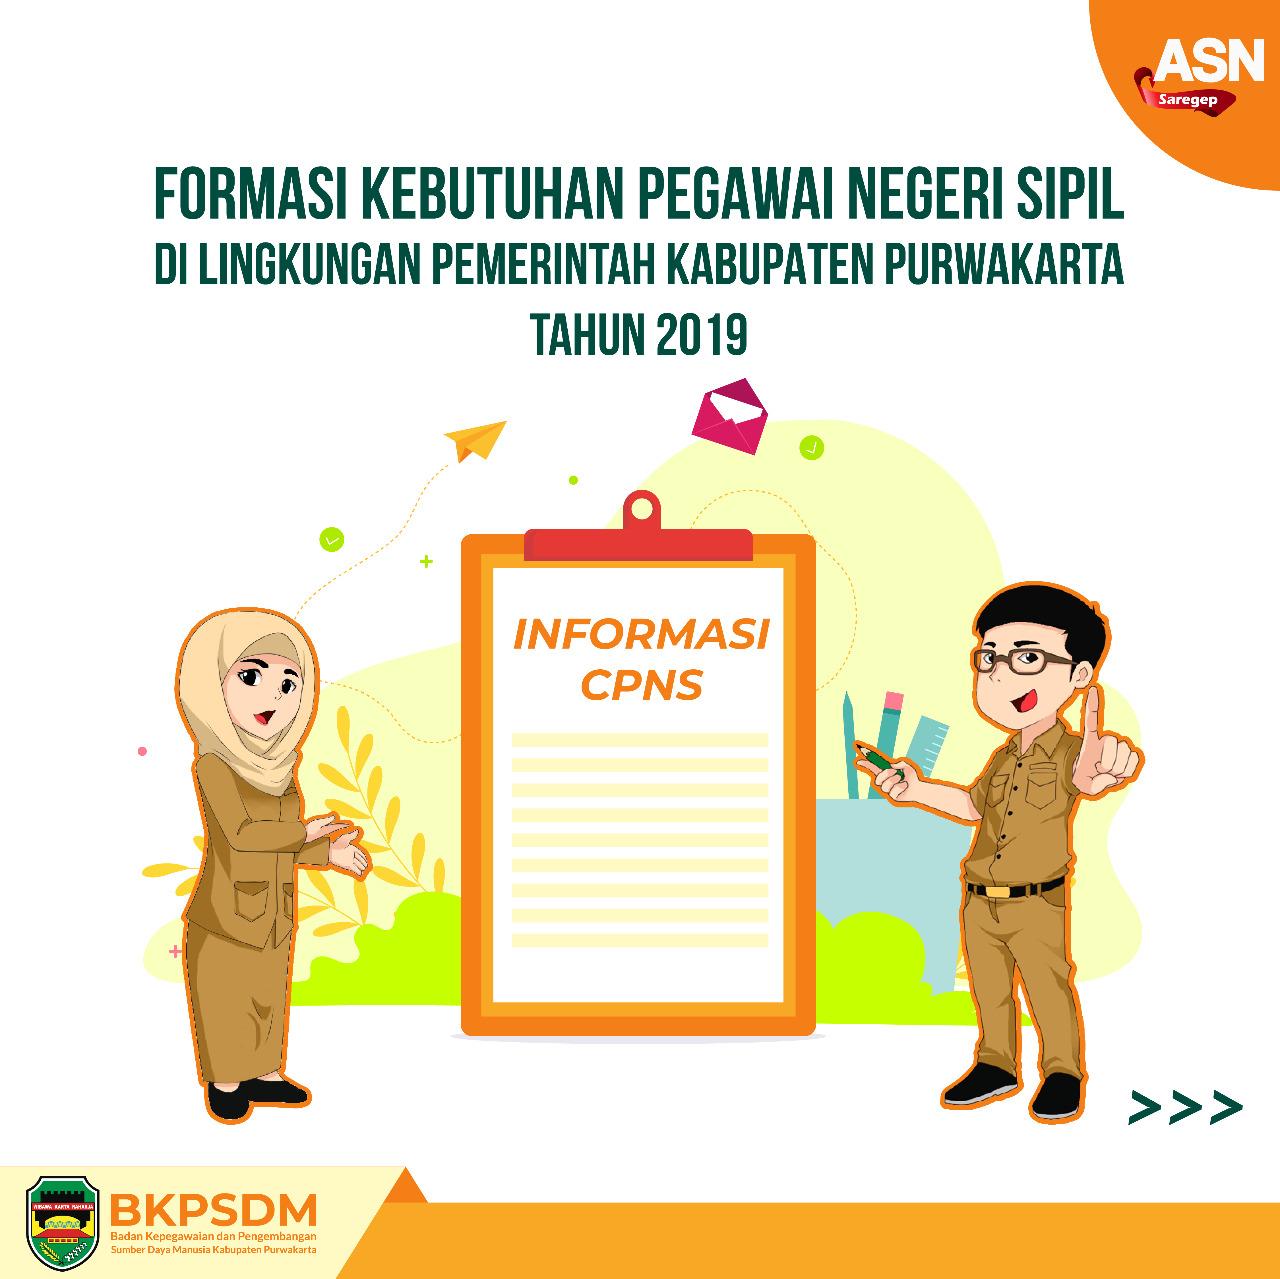 Pendaftaran Calon Pegawai Negeri Sipil Kabupaten Purwakarta Tahun 2019